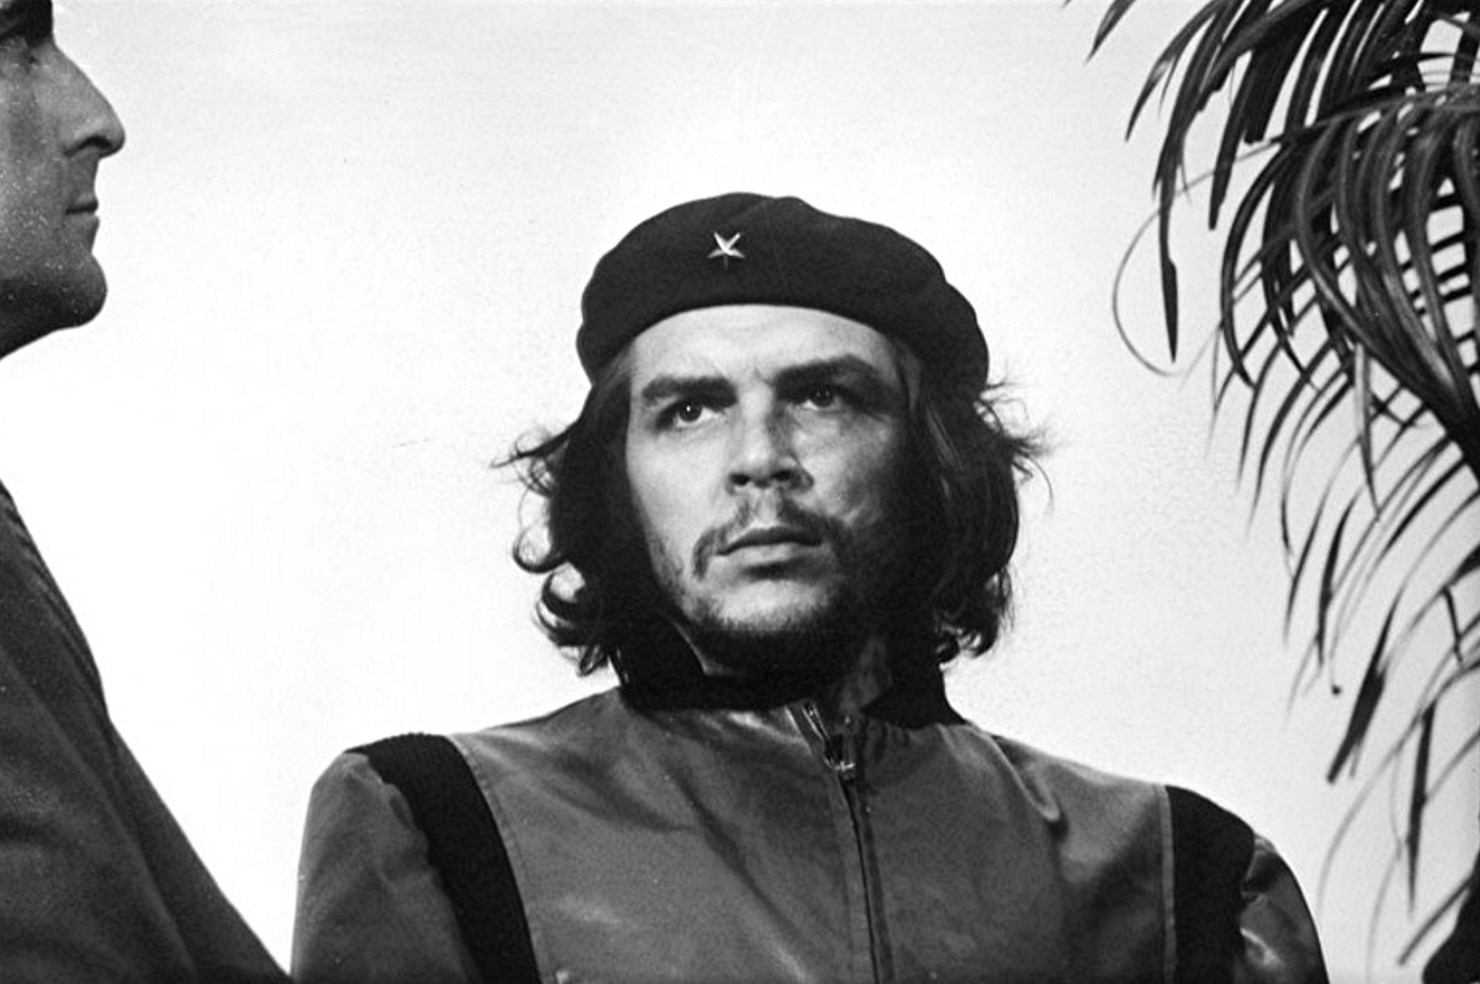 https://en.wikipedia.org/wiki/Guerrillero_Heroico